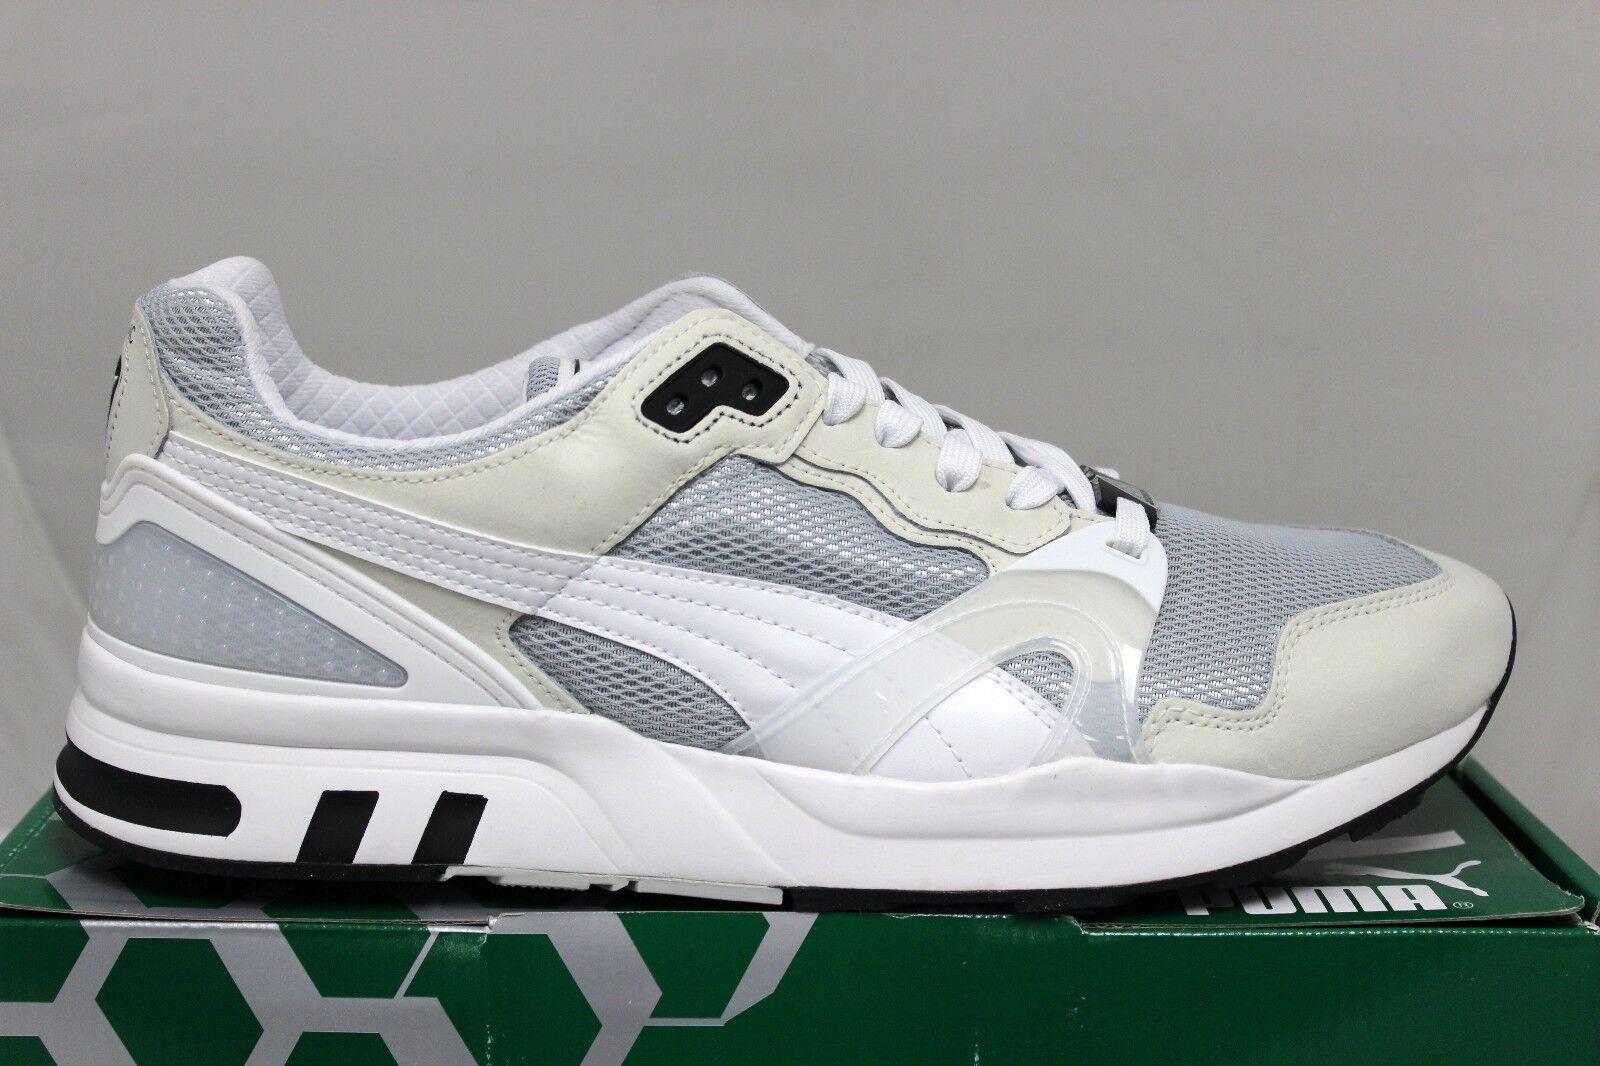 Puma xt2 bianco su zecca bianco 358138 01 puma bianco d'argento, nuovo di zecca su 6543f8